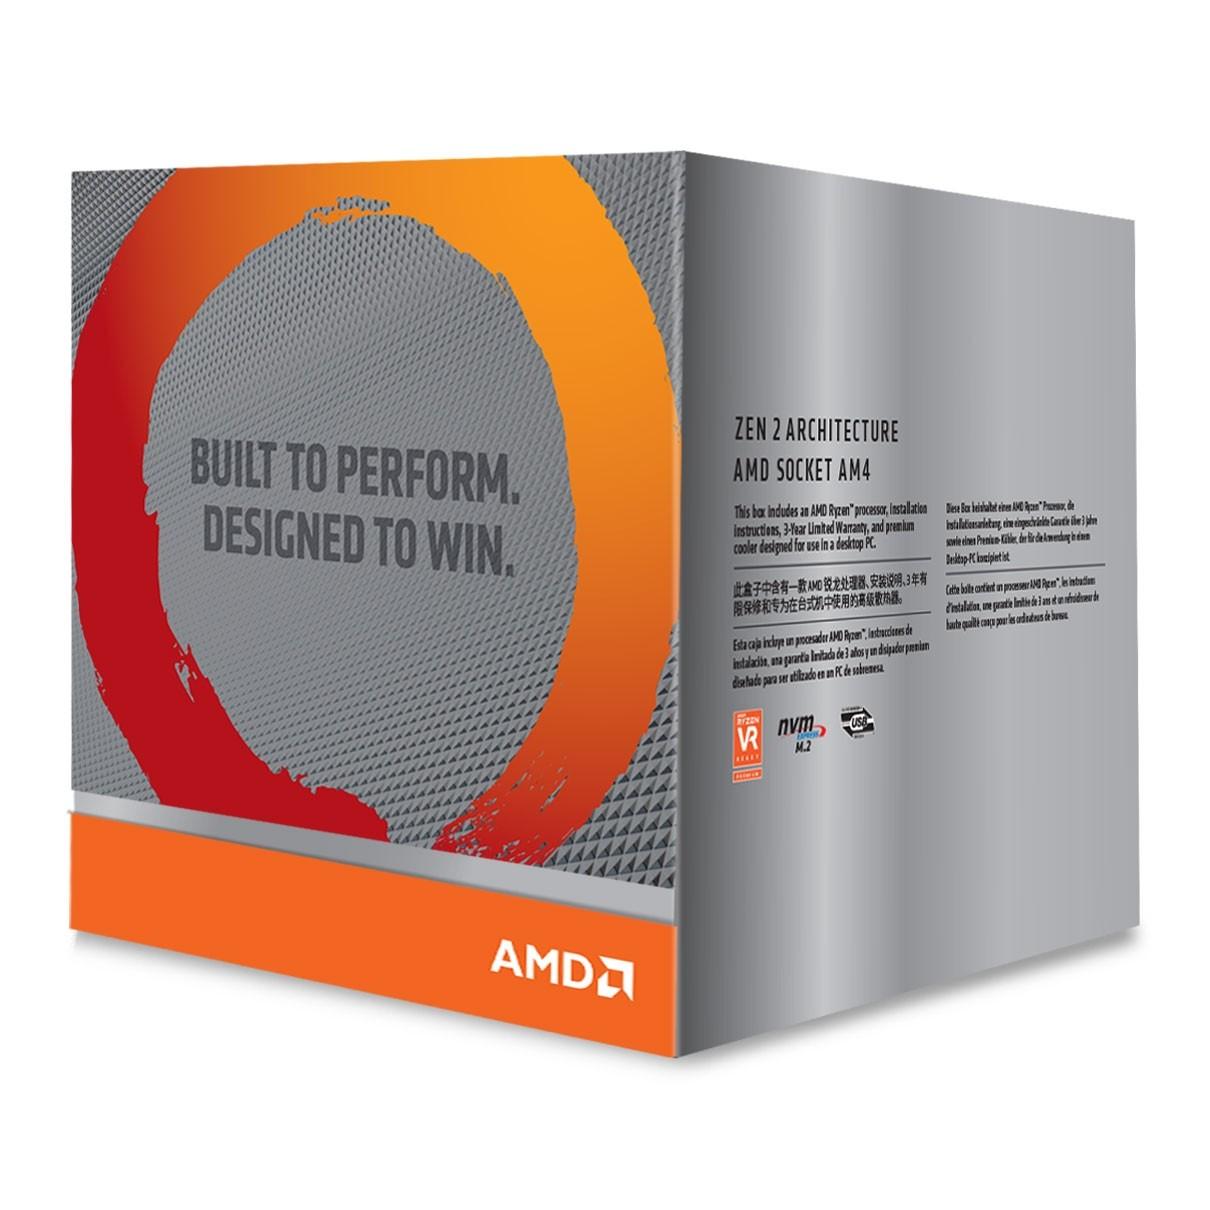 AMD Ryzen 9 3900X Gen3, AM4, Zen 2, 12 Core, 24 Thread, 3 8GHz, 4 6GHz  Turbo, 64MB L3, PCIe 4 0, 10